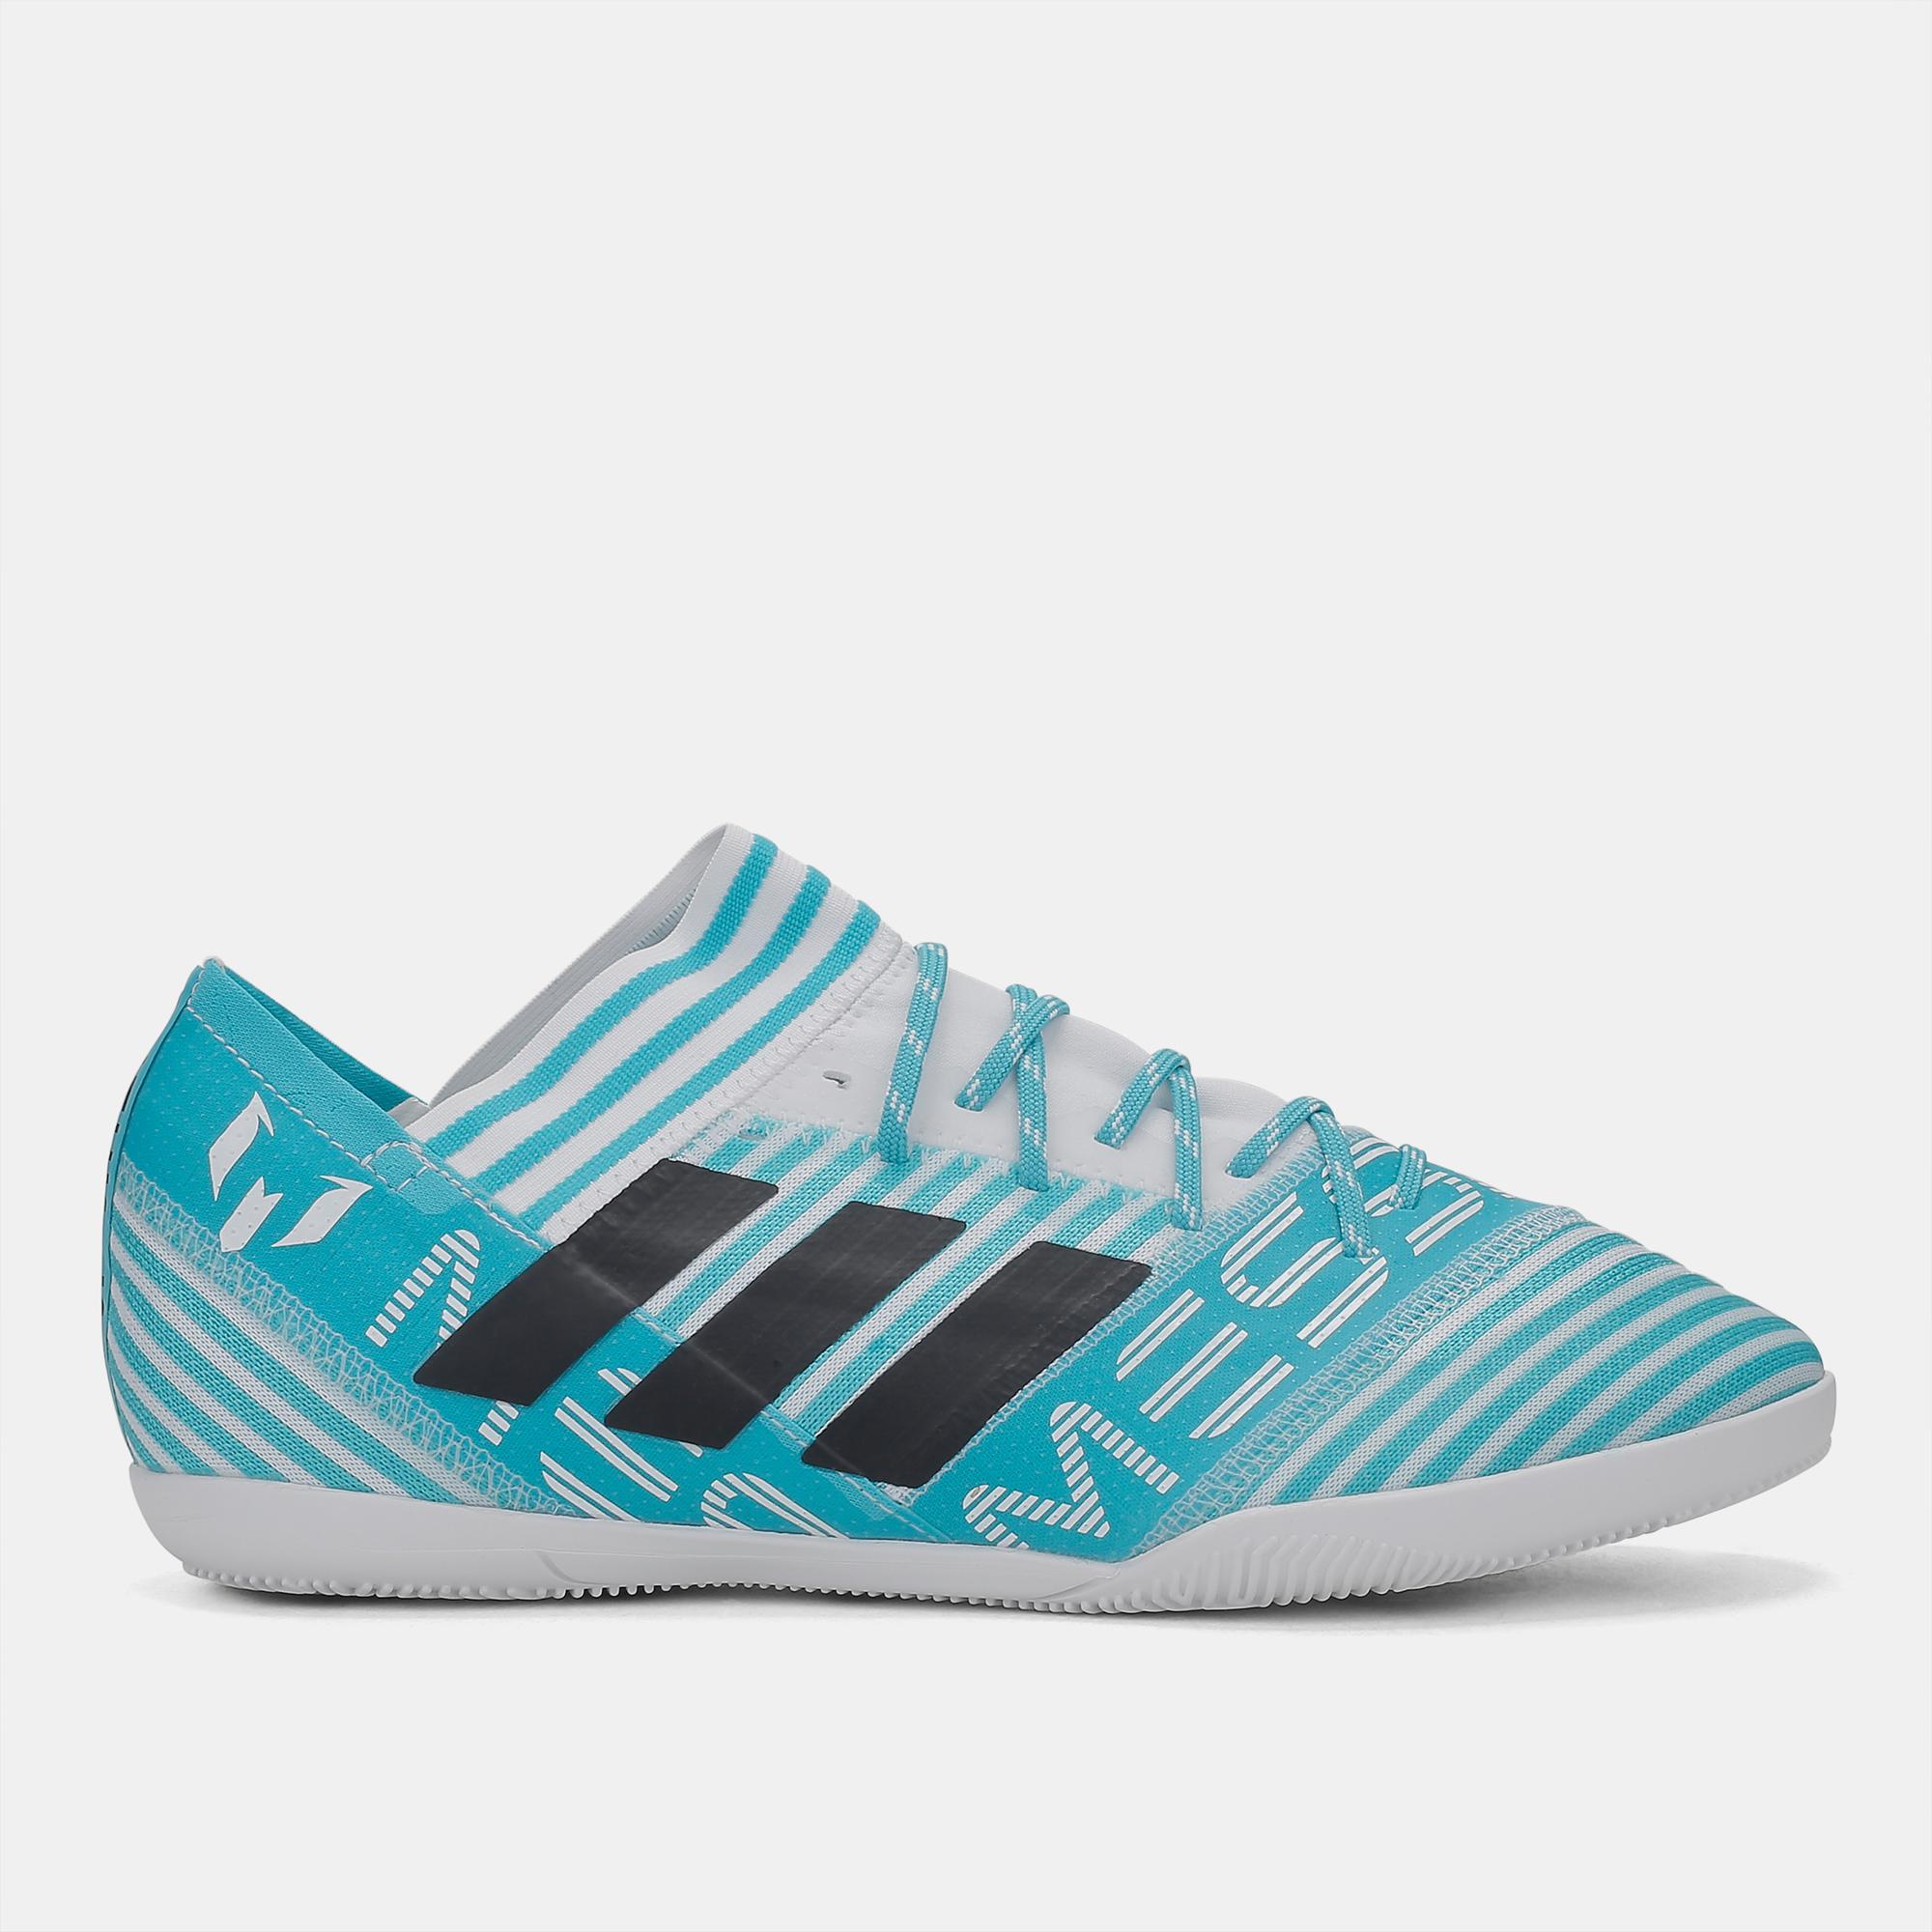 adidas Nemeziz Messi Tango 17.3 Indoor Court Football Shoe ... 0efa809698